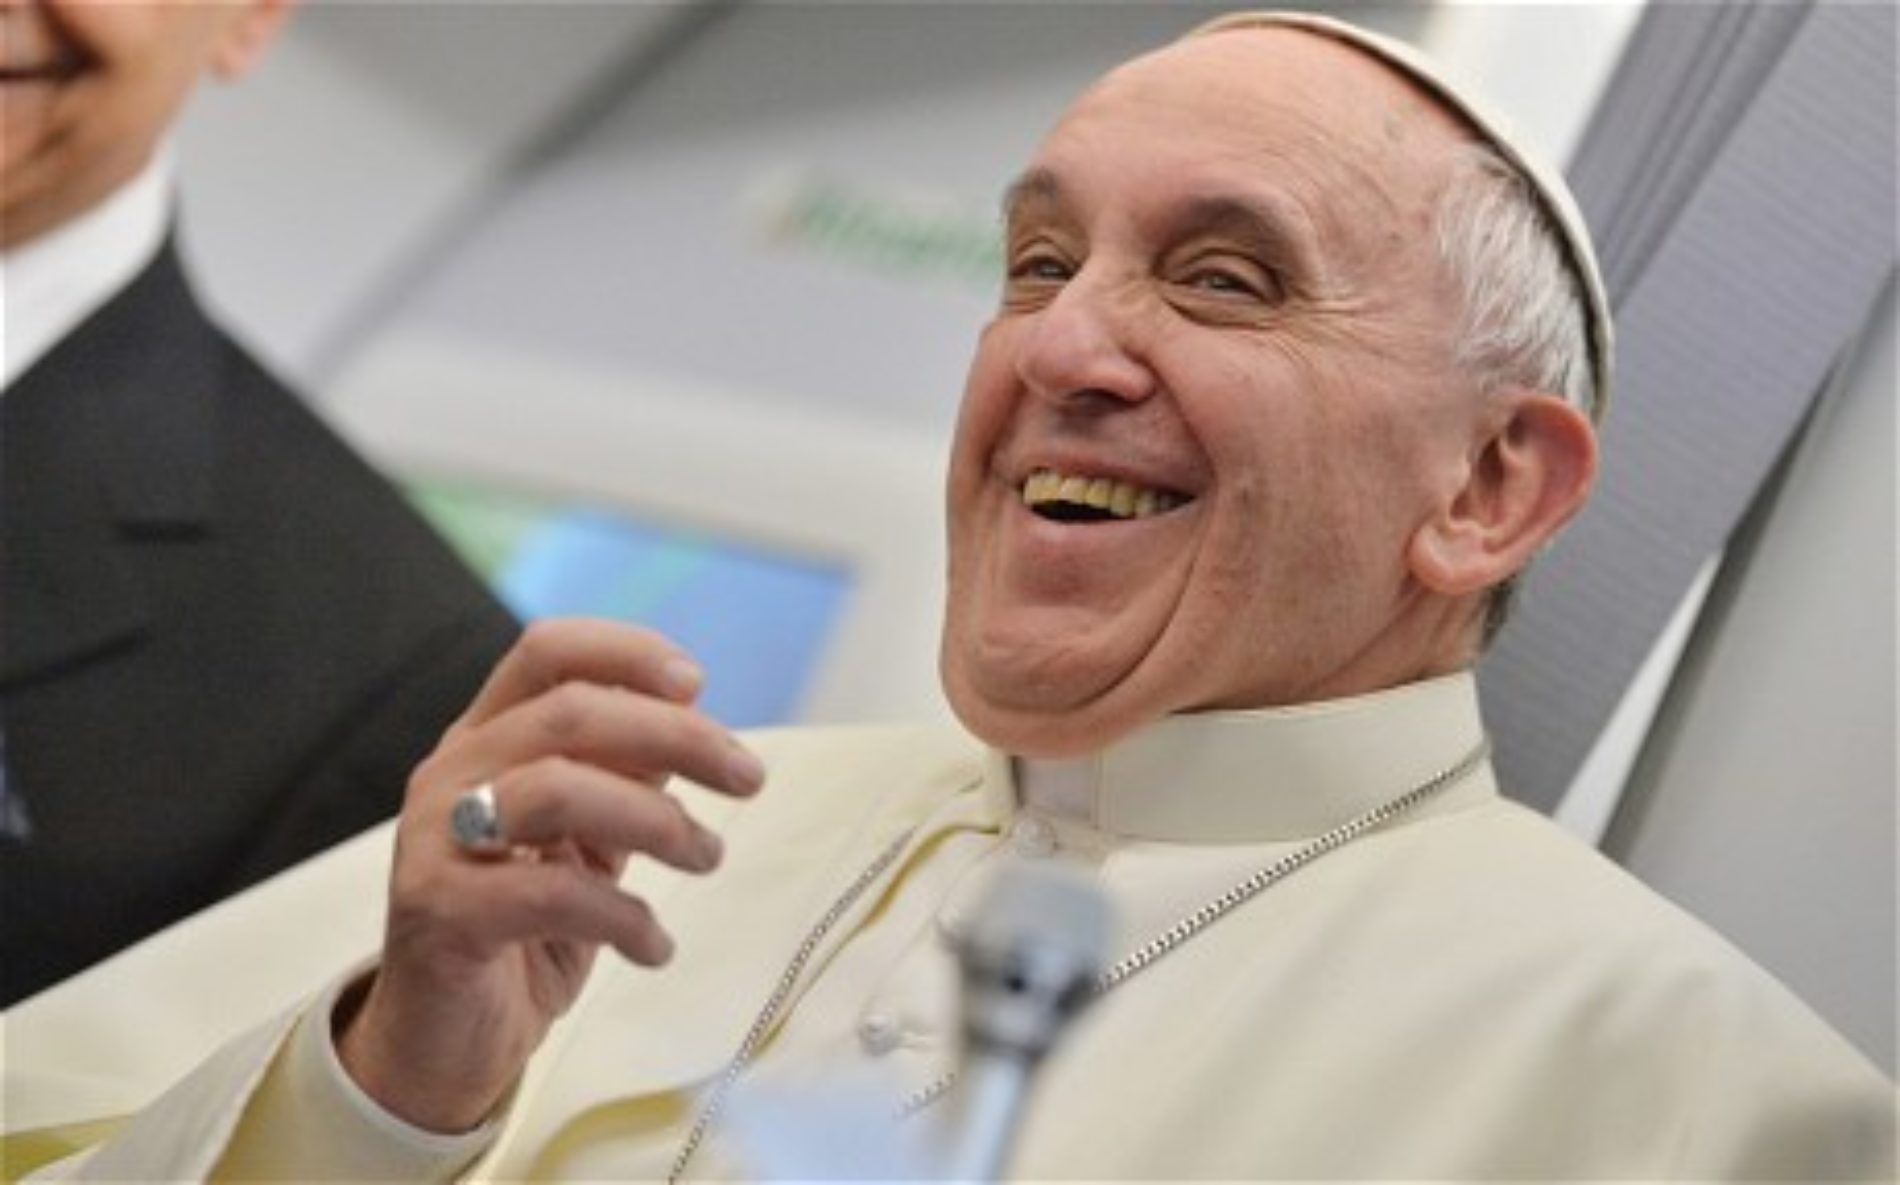 Gay rights groups laud new Catholic tone